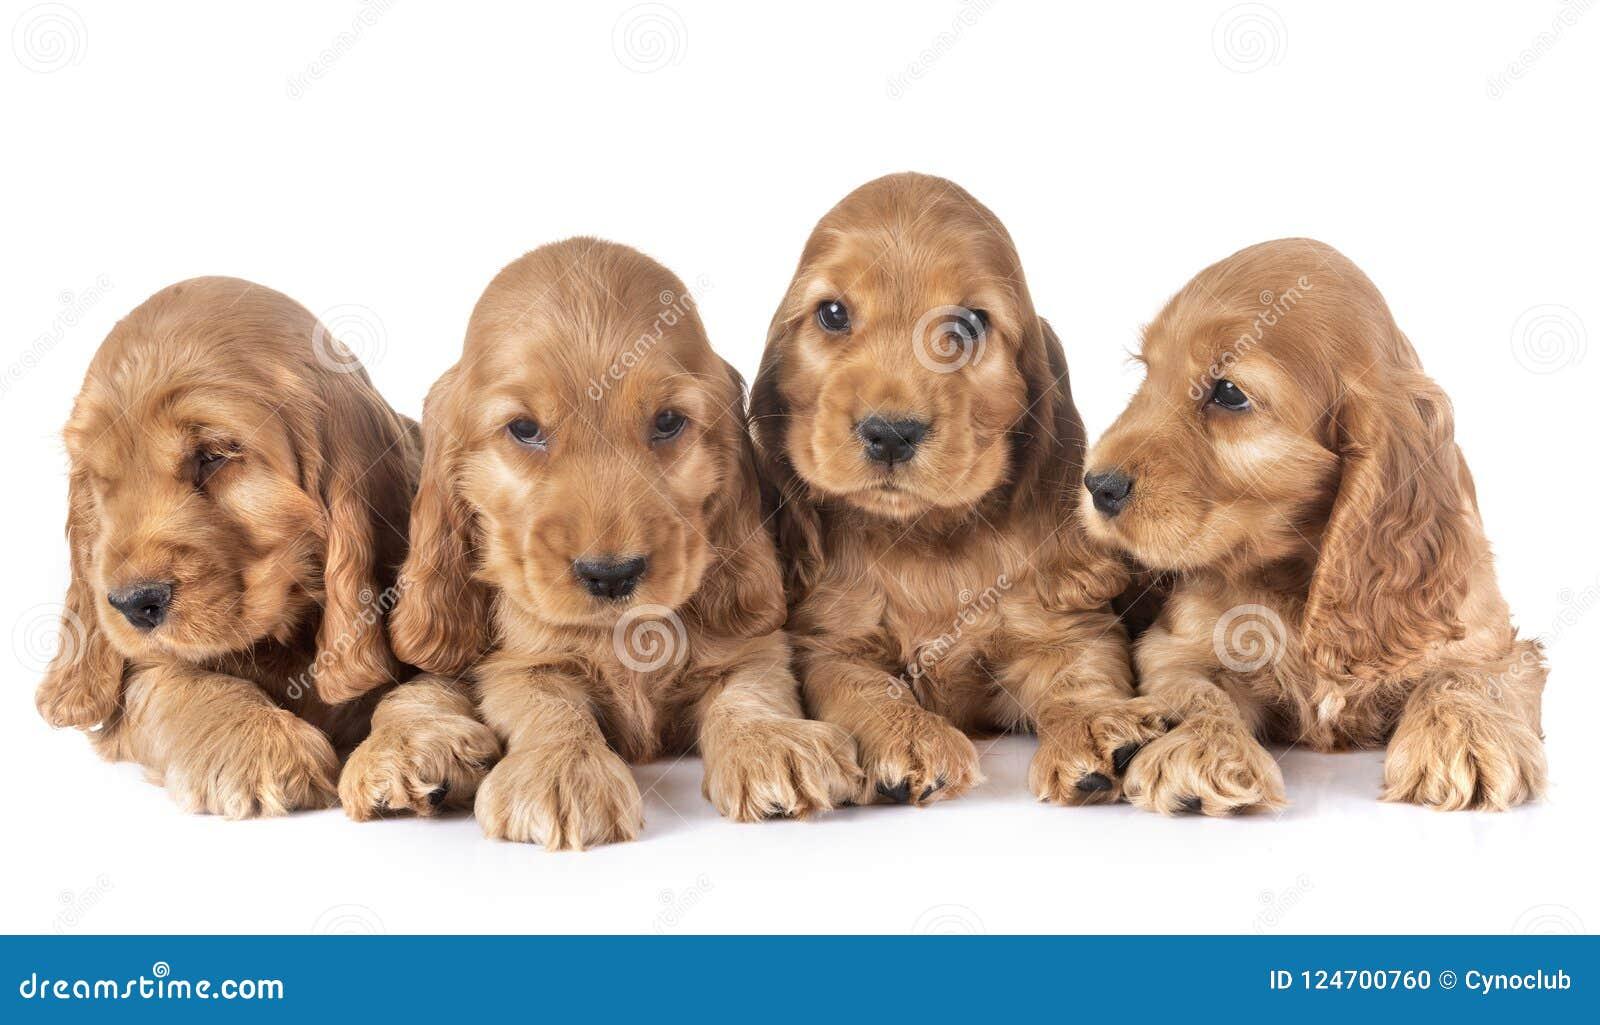 Puppies cocker spaniel